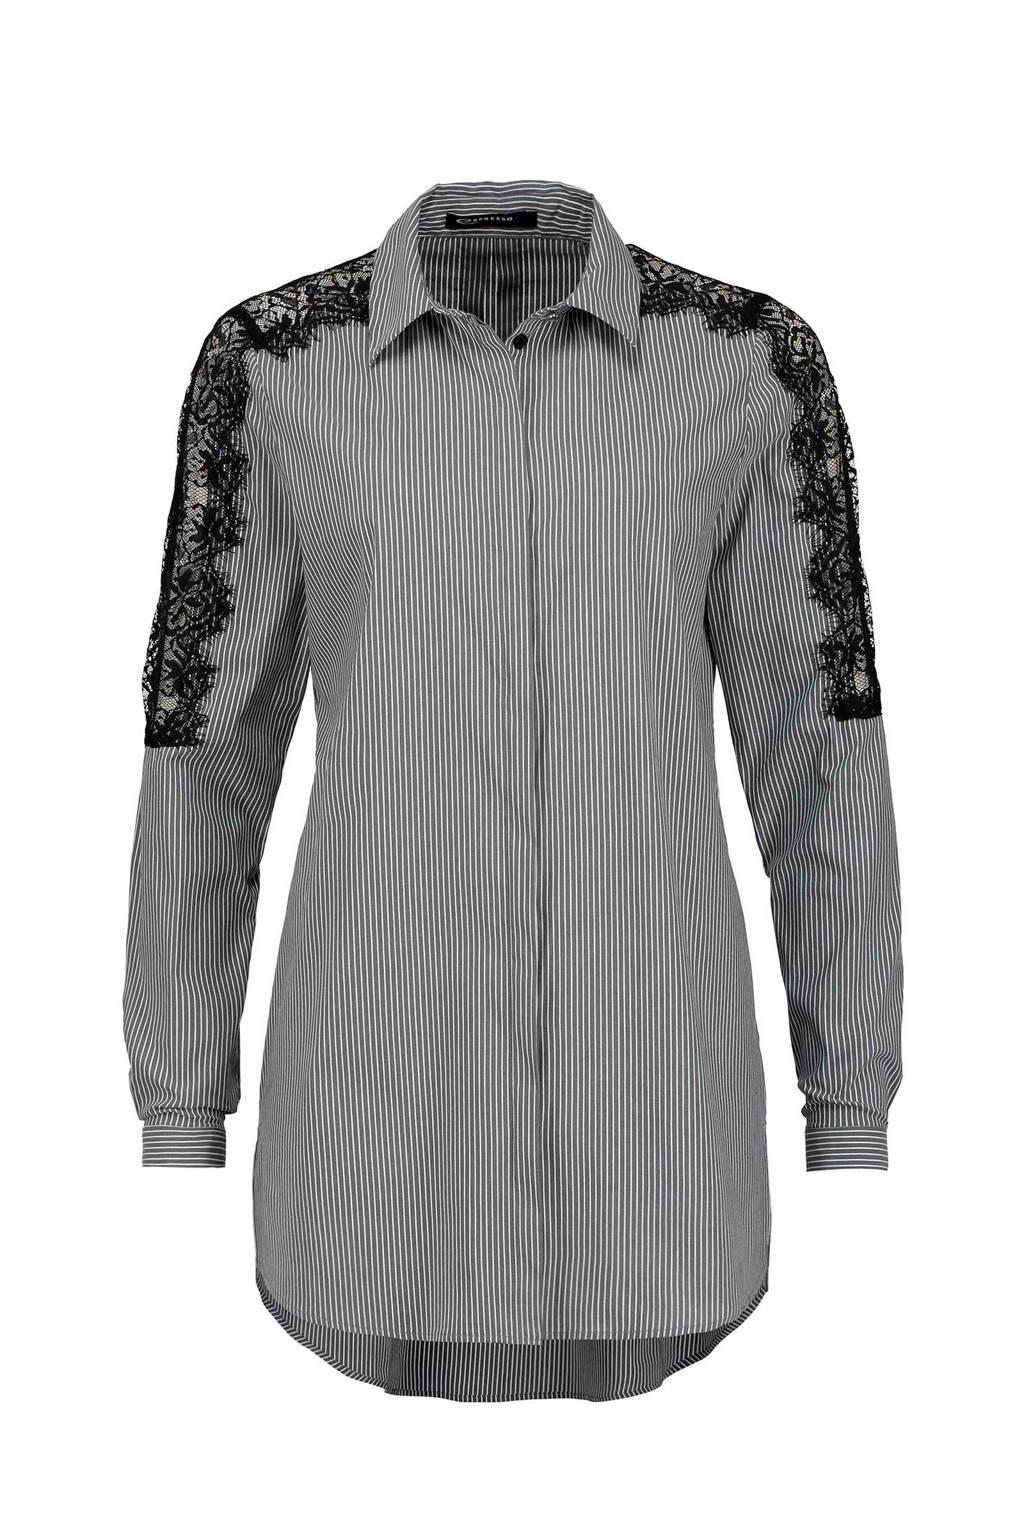 Expresso Rebel blouse, Grijs/wit/zwart